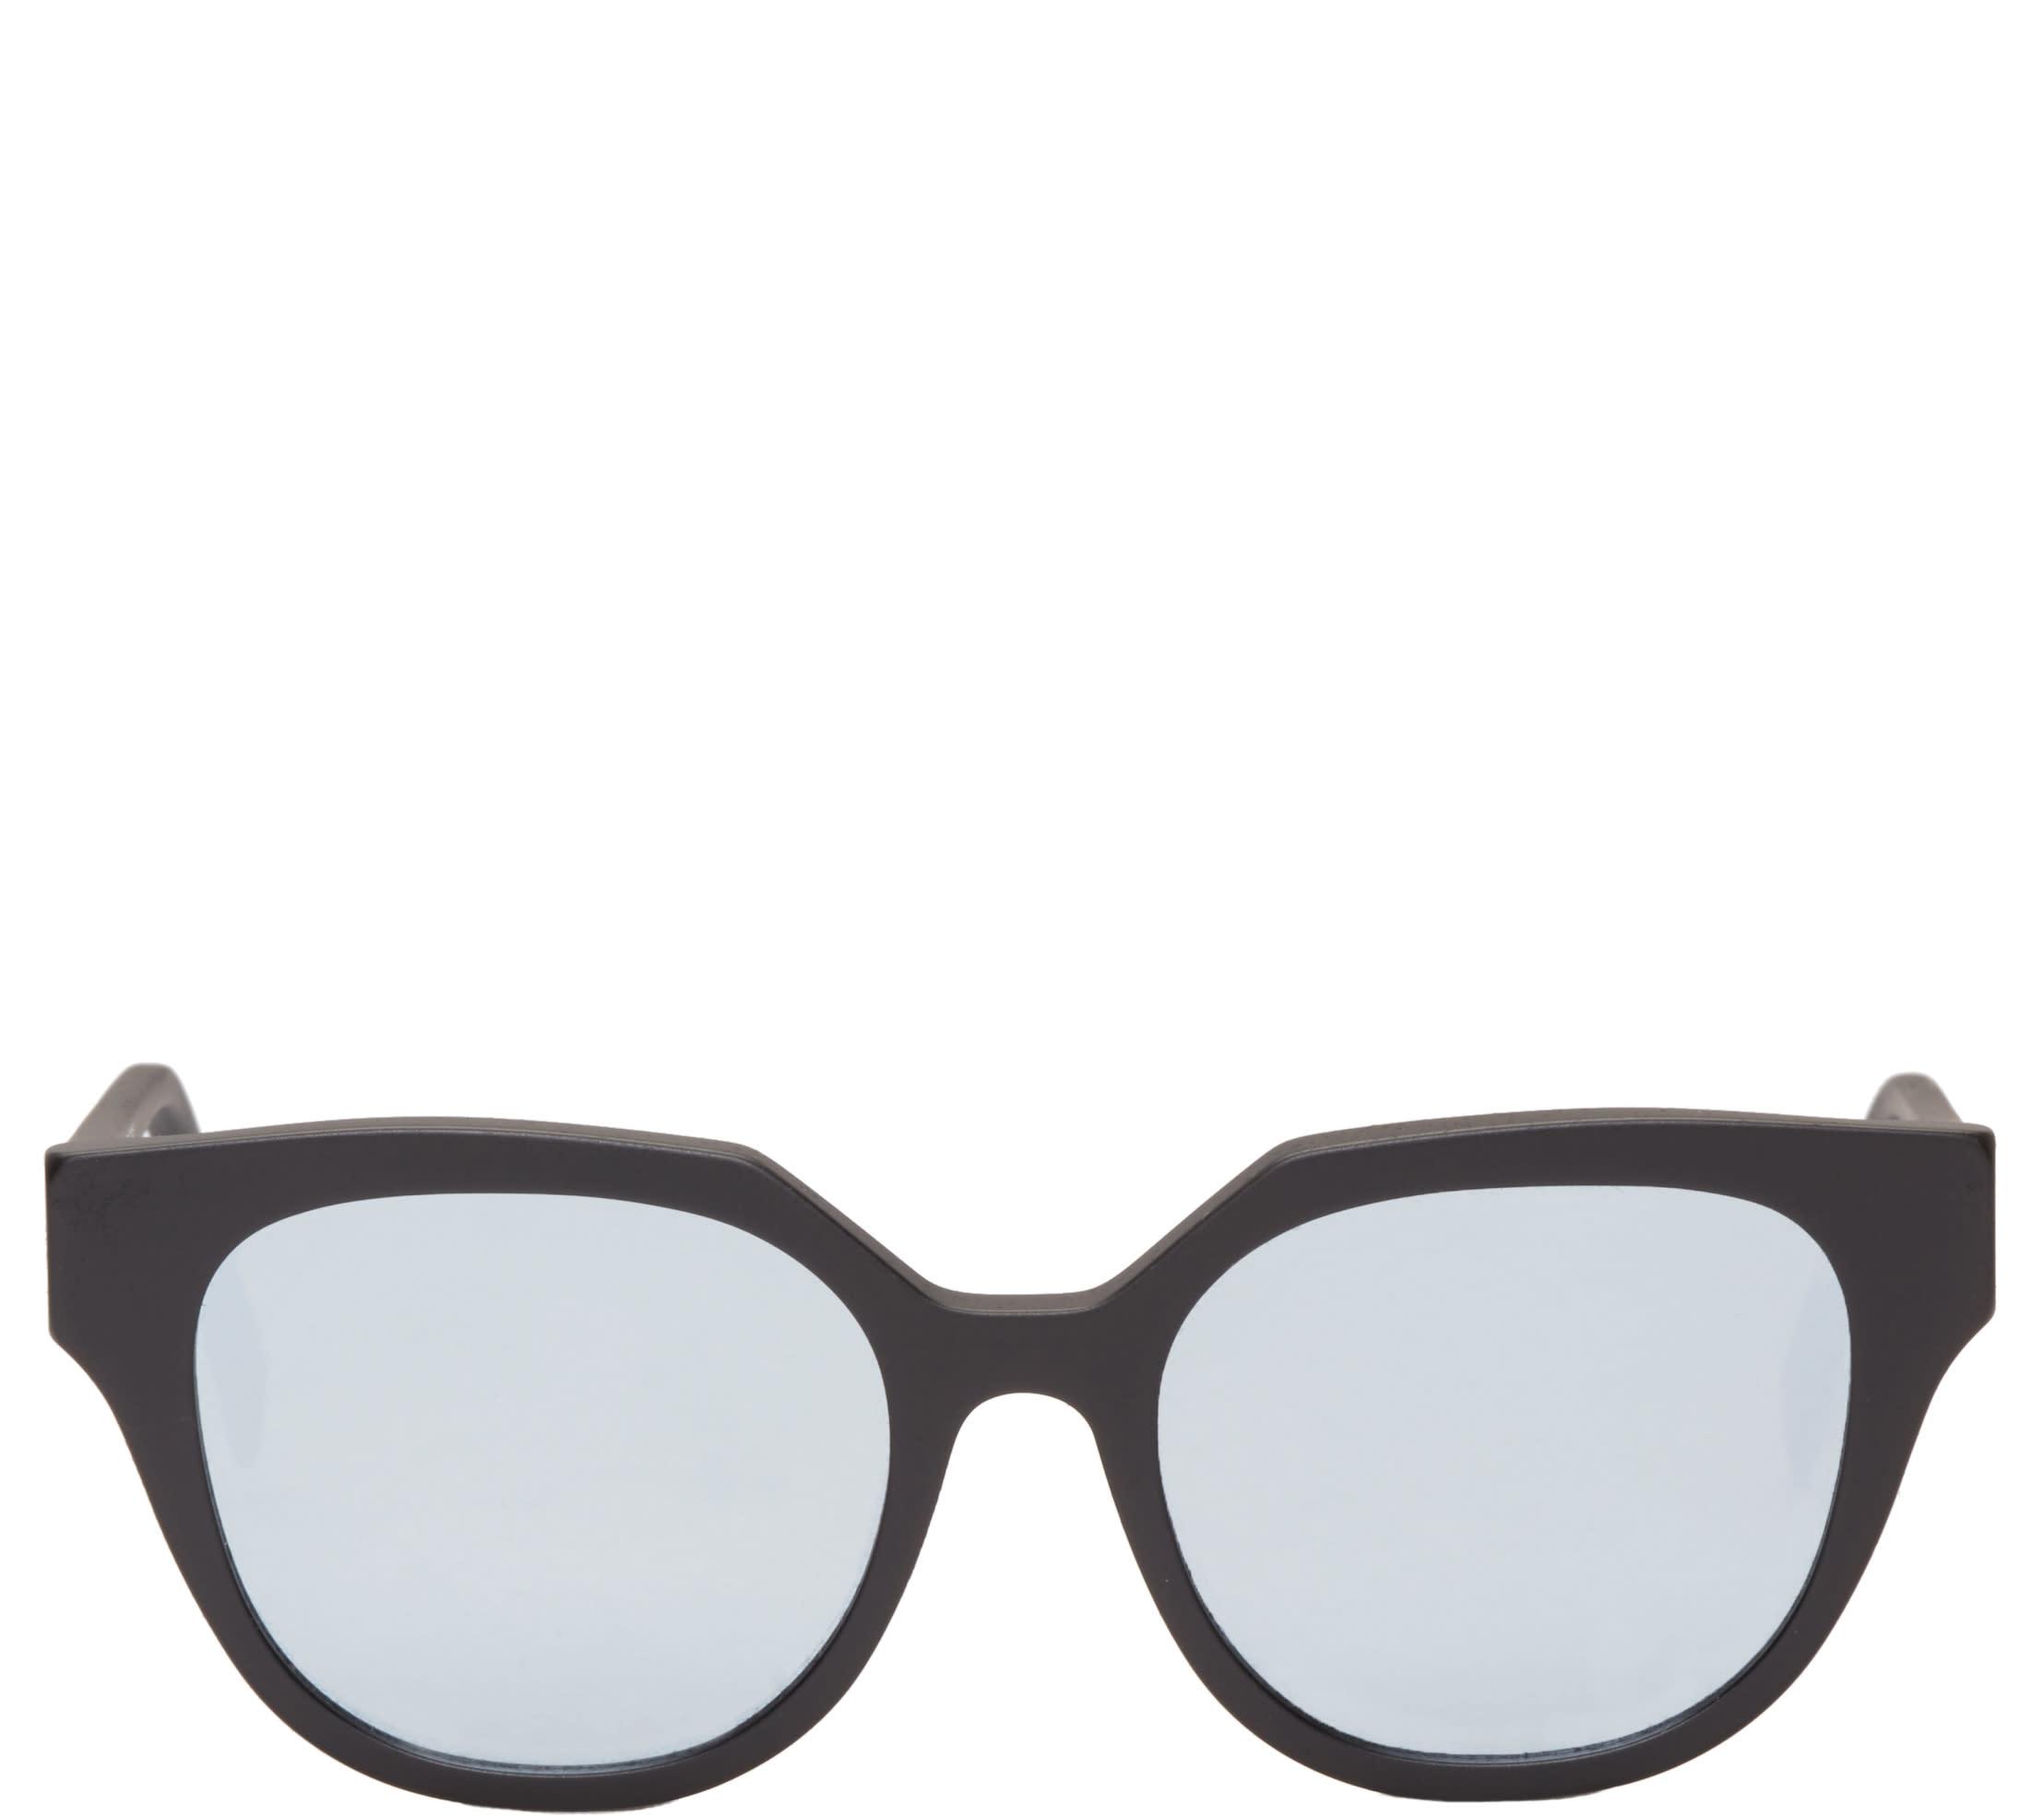 Super Black Matte Sunglasses